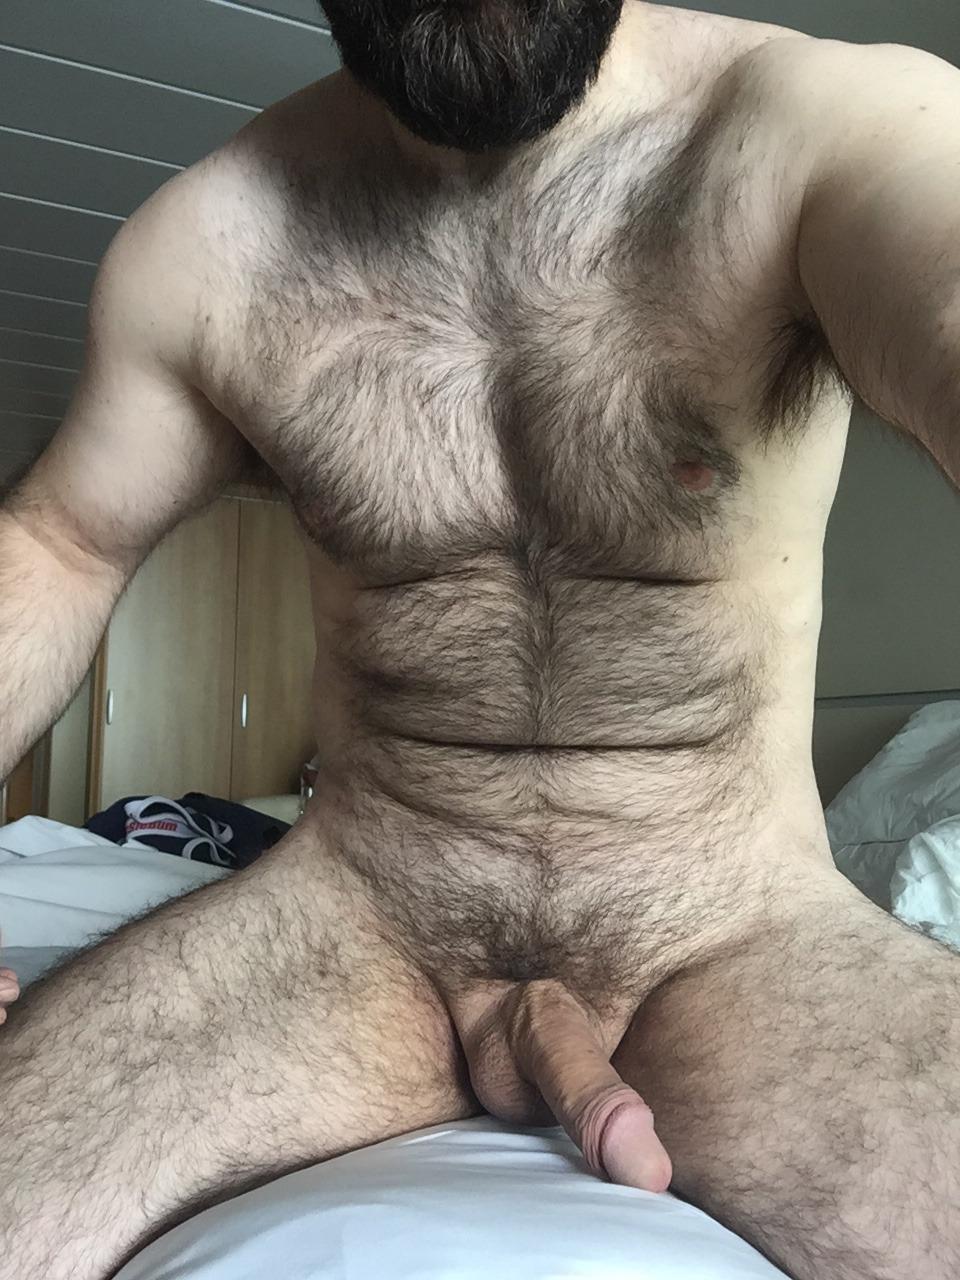 photo : 166185608600 beardburnme http://www.neofic.com